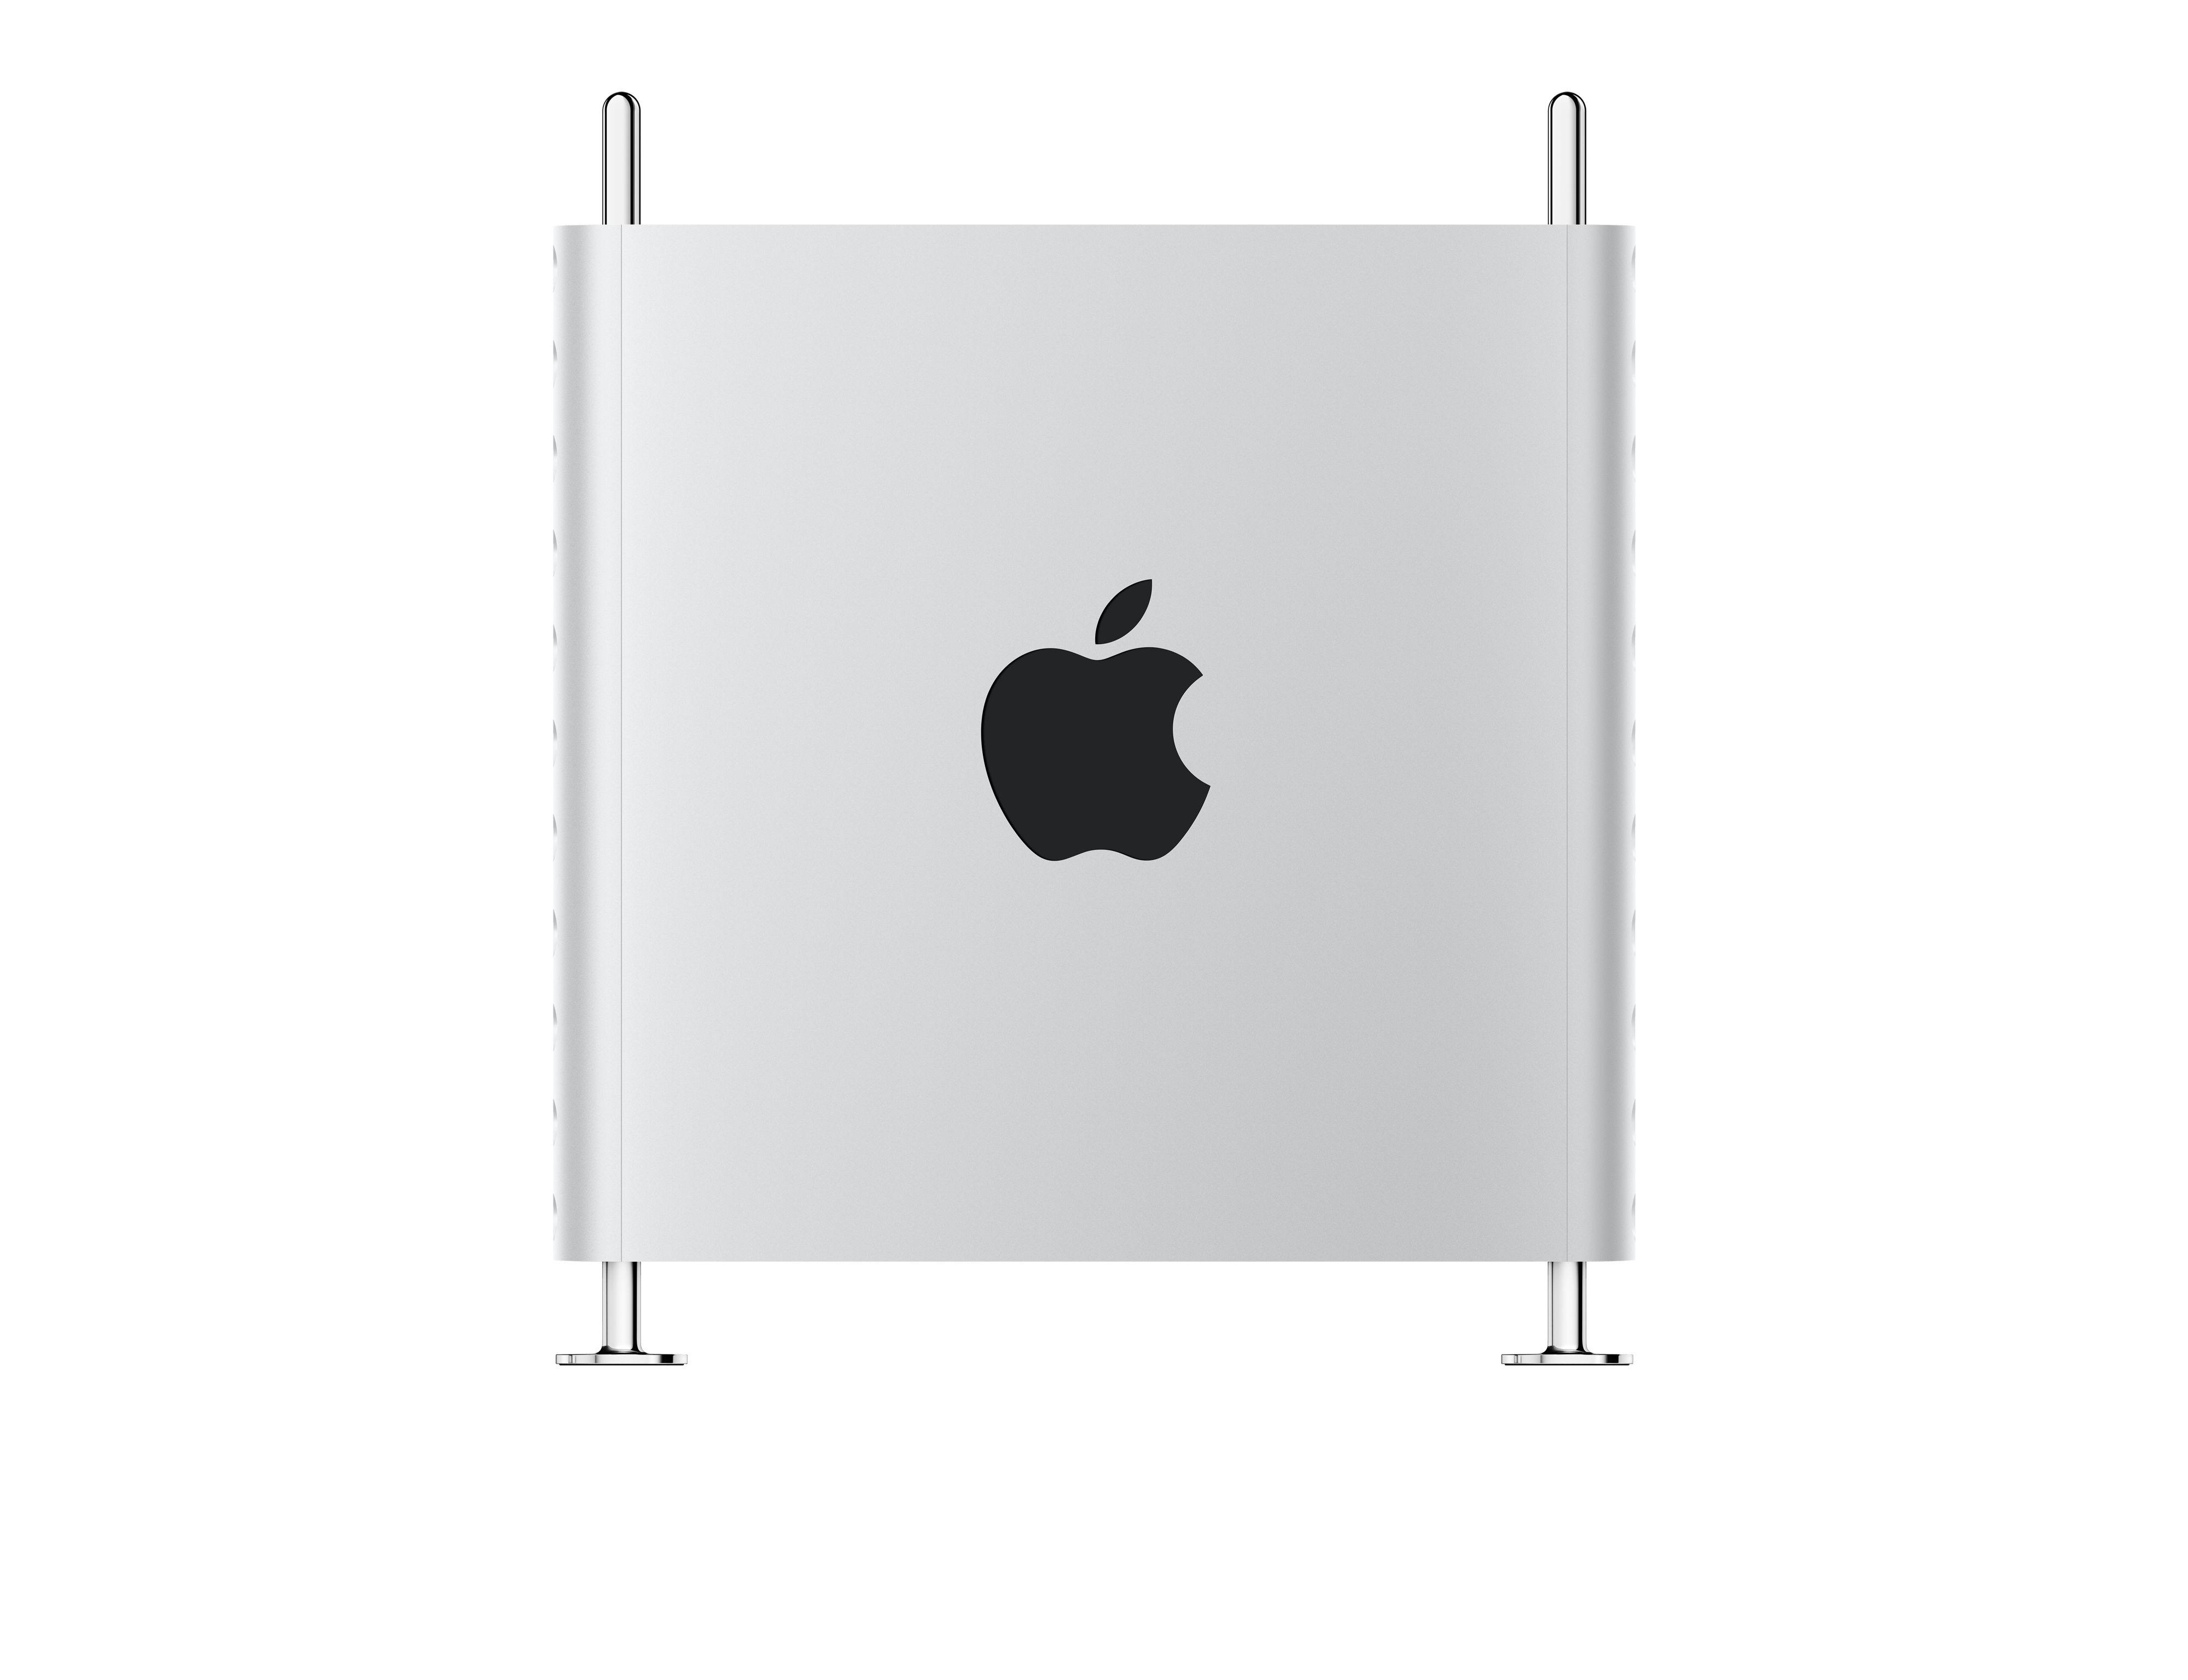 Buy Mac Pro Tower - Apple (HK)